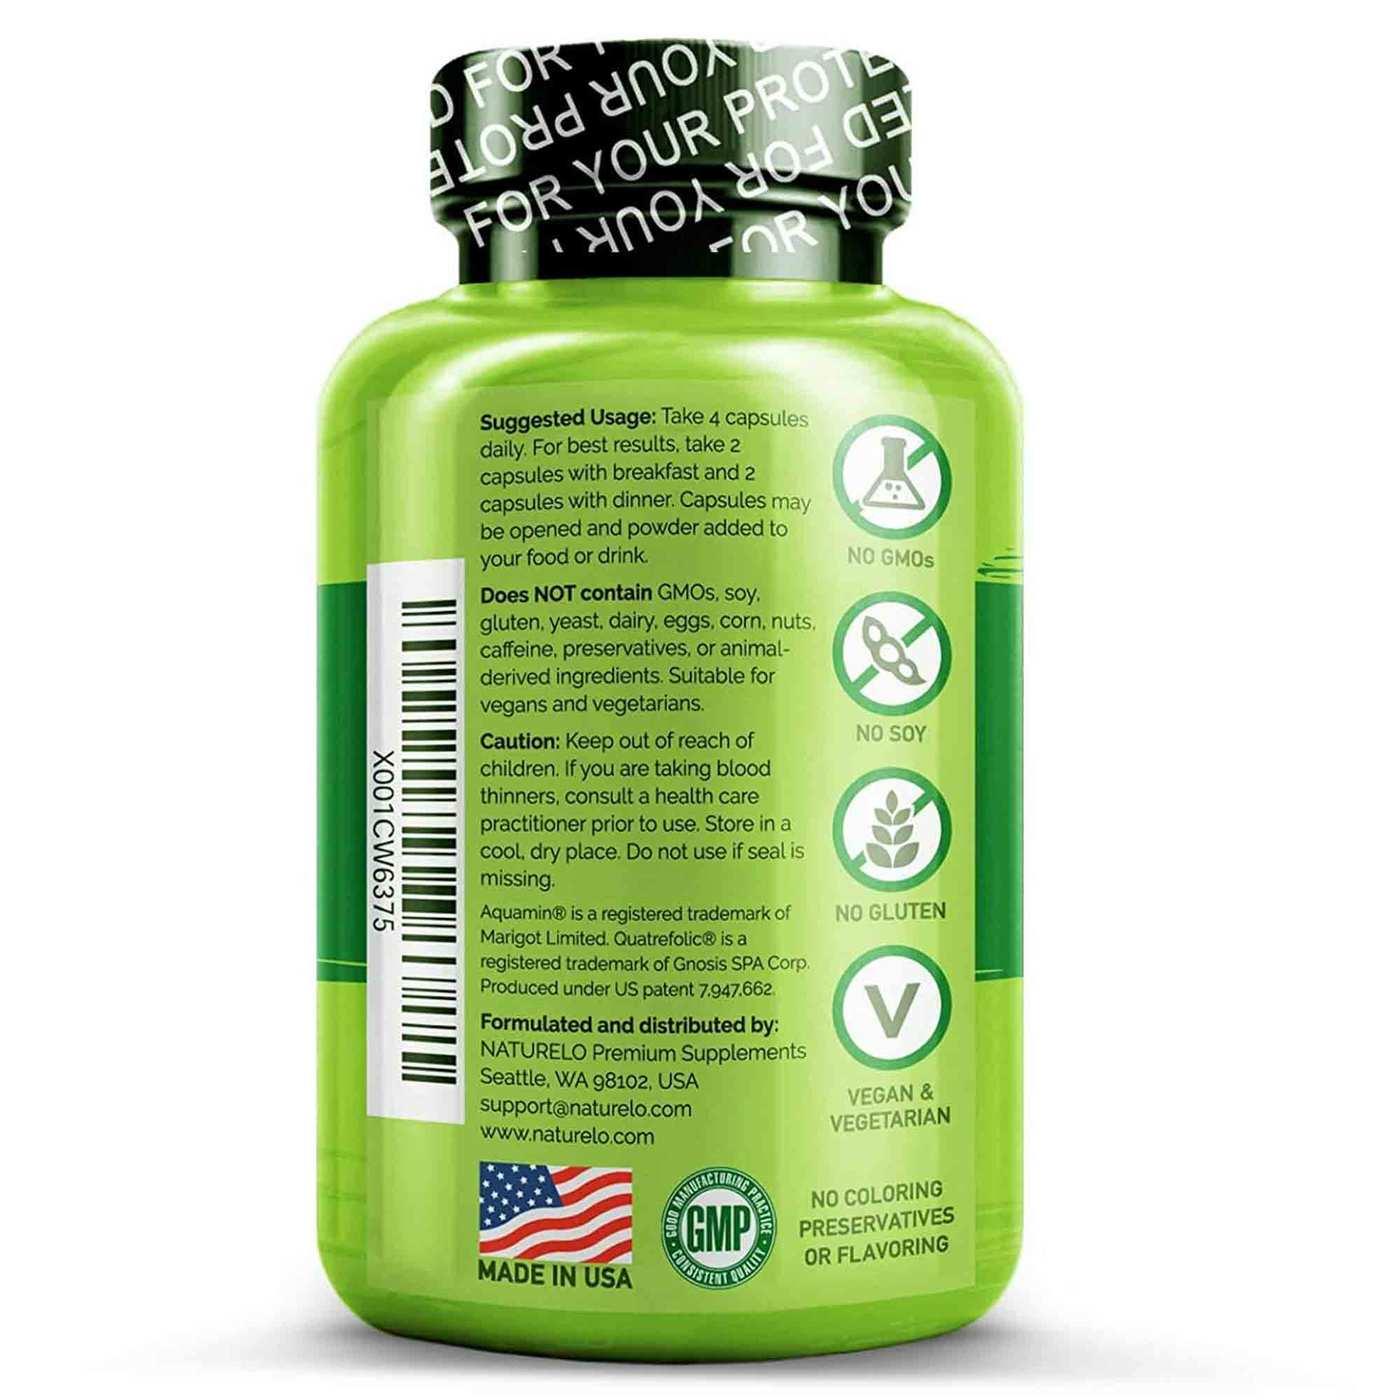 NATURELO Whole Food Multivitamin for Women Iron Free - 120 ...